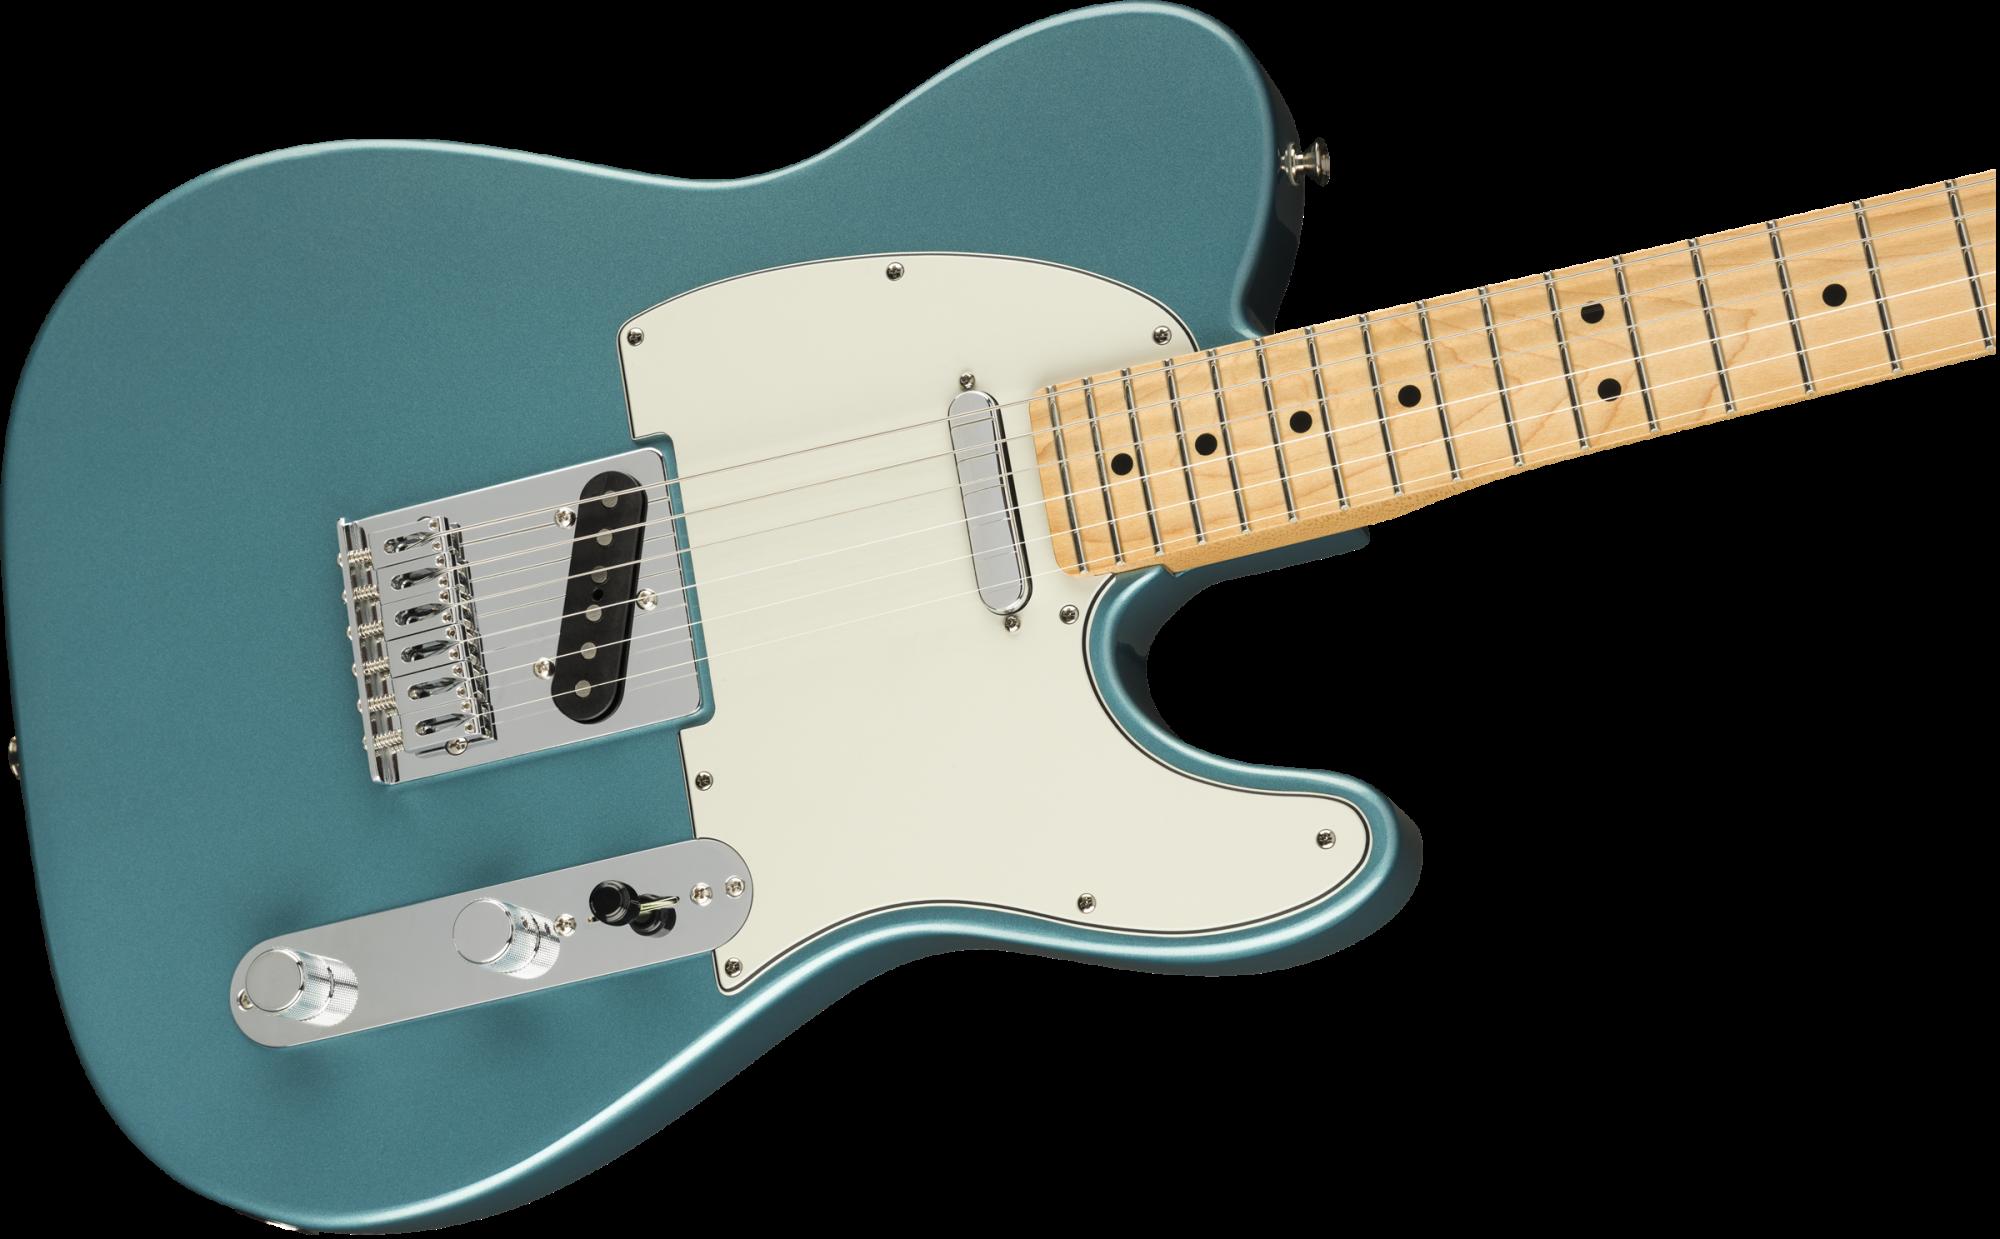 Fender Player Telecaster Maple Fingerboard - Tidepool